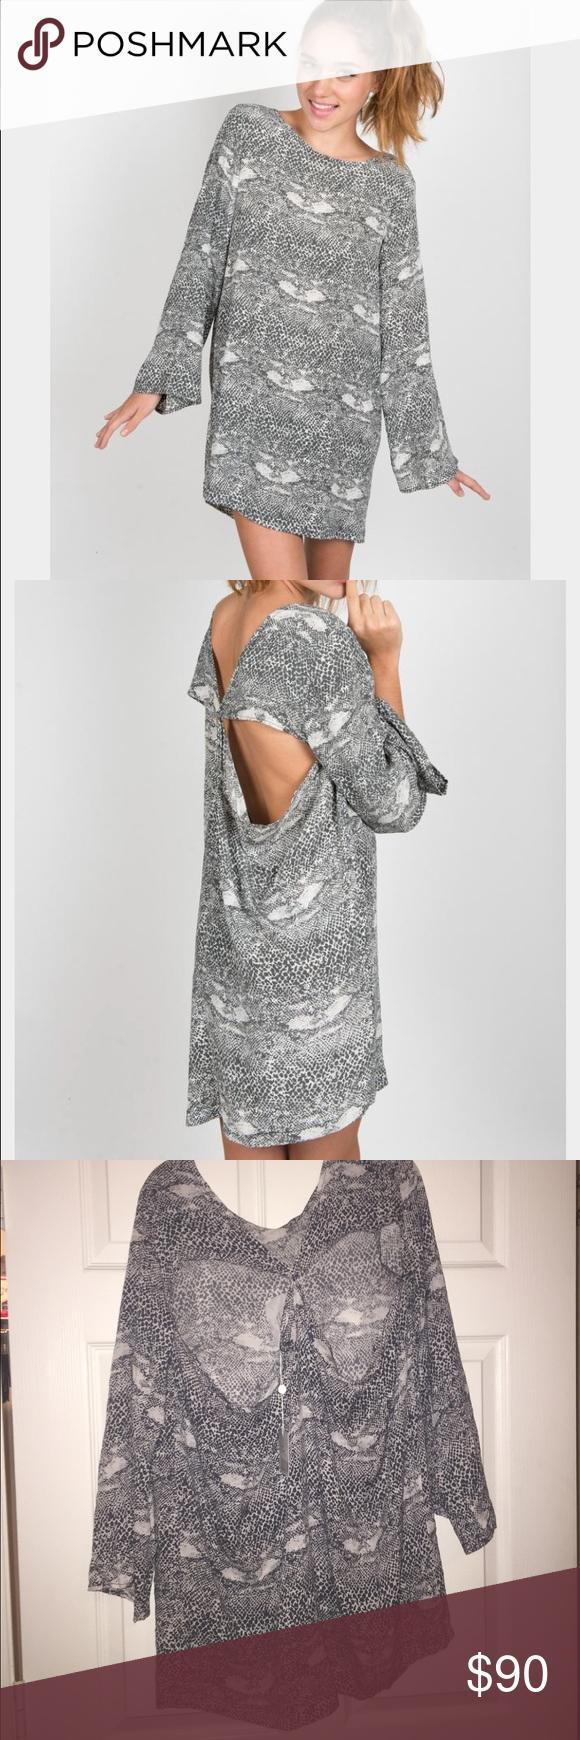 ACACIA Tortolla Dress in Snake Brand new with tags acacia swimwear Swim